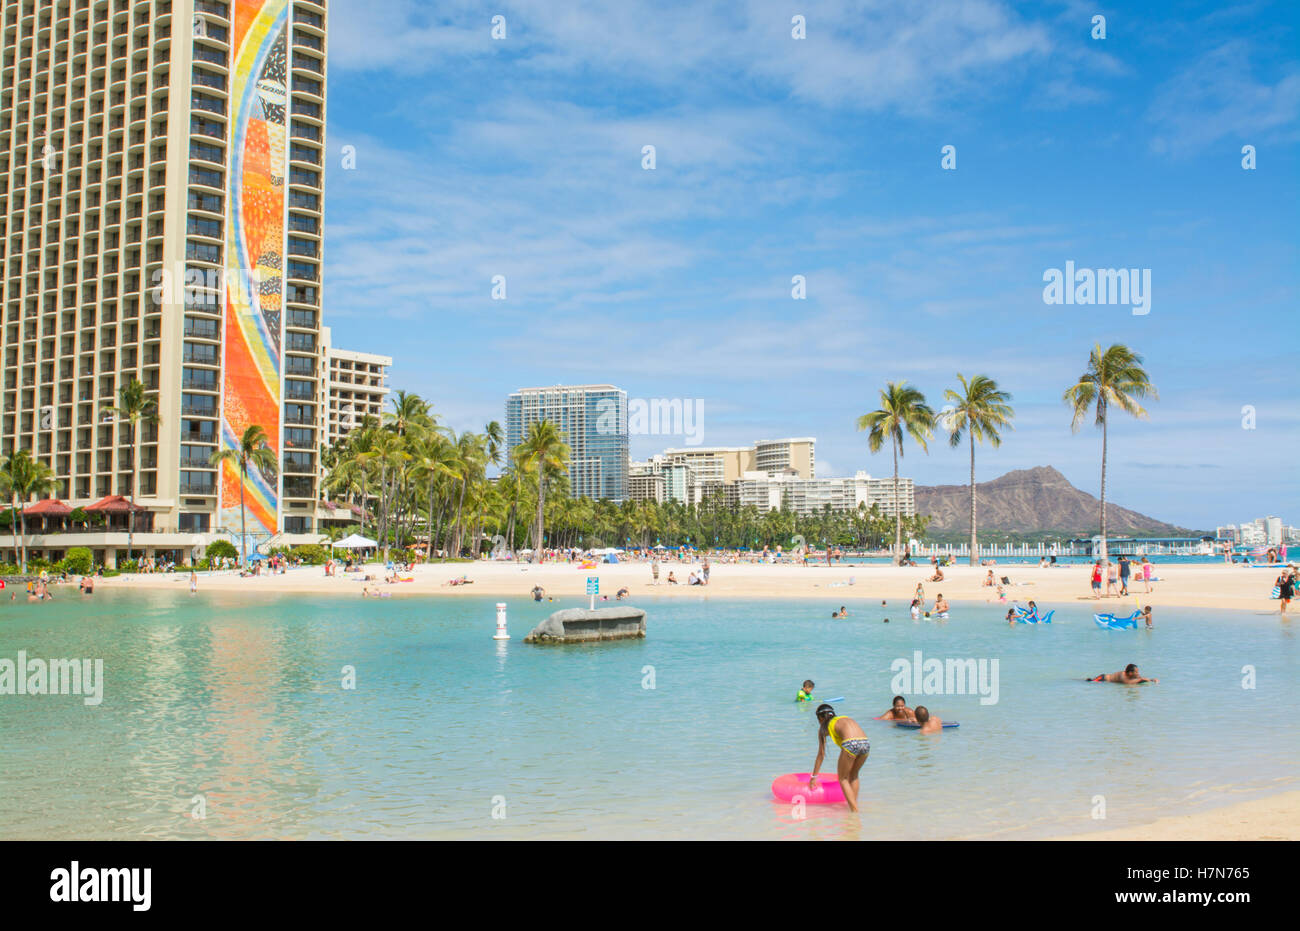 Honolulu Hawaii Oahu famous Hilton Hawaiian Waikiki Beach Resort with Diamond Head in Distance with beach and ocean - Stock Image